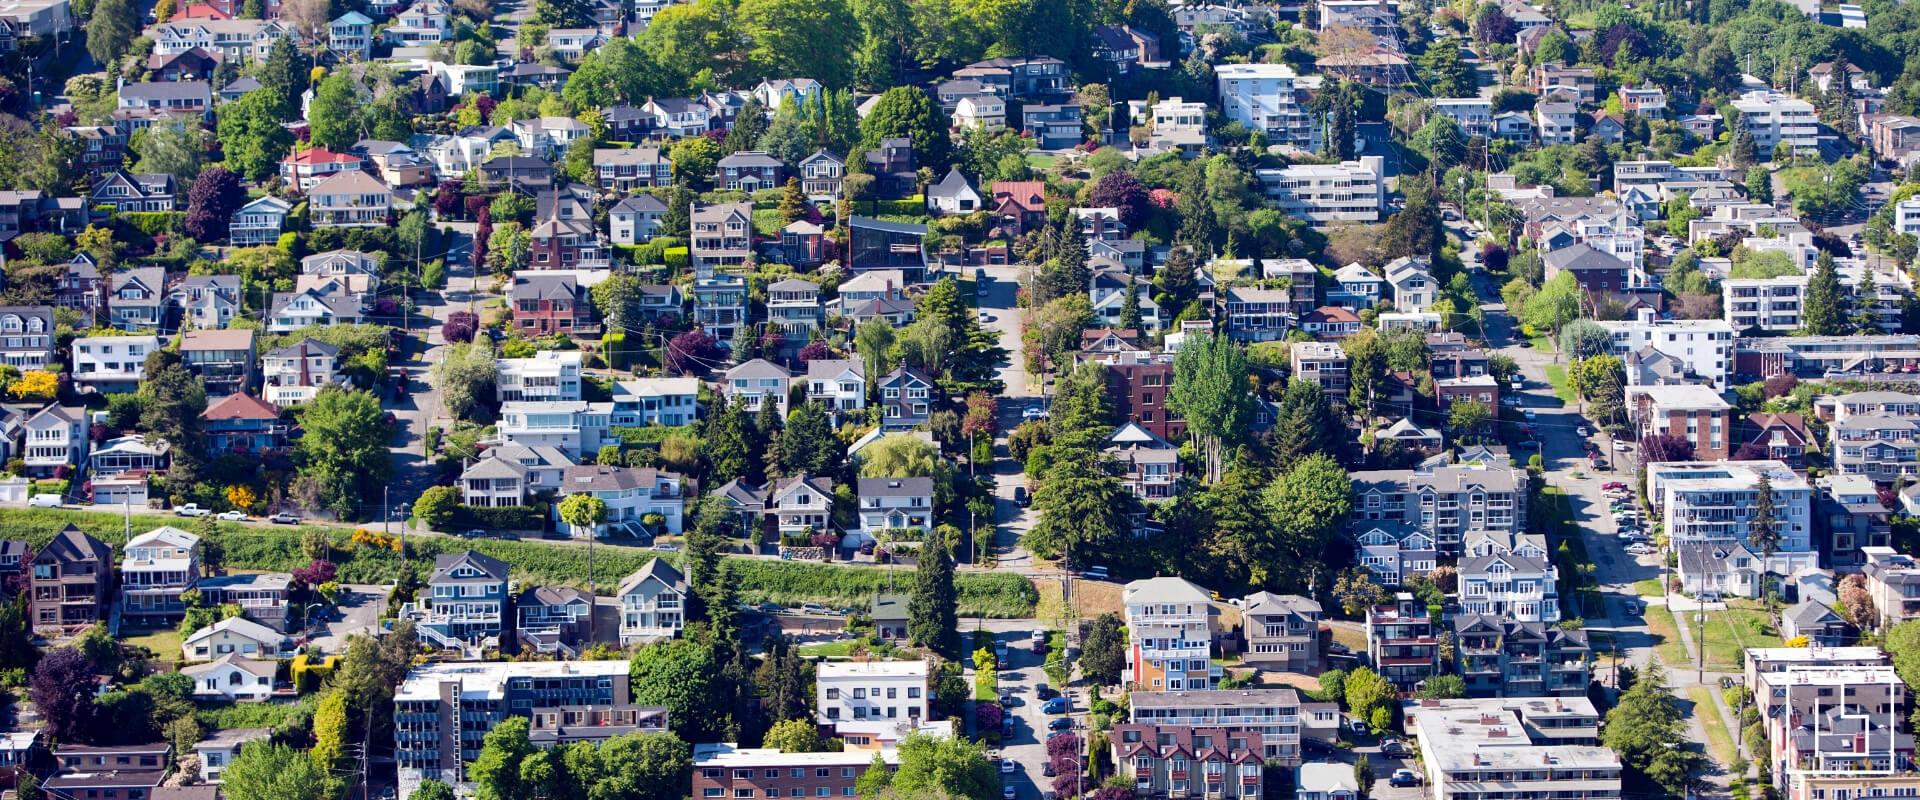 Seattle Hot Housing Market 2018 - Beachworks LLC